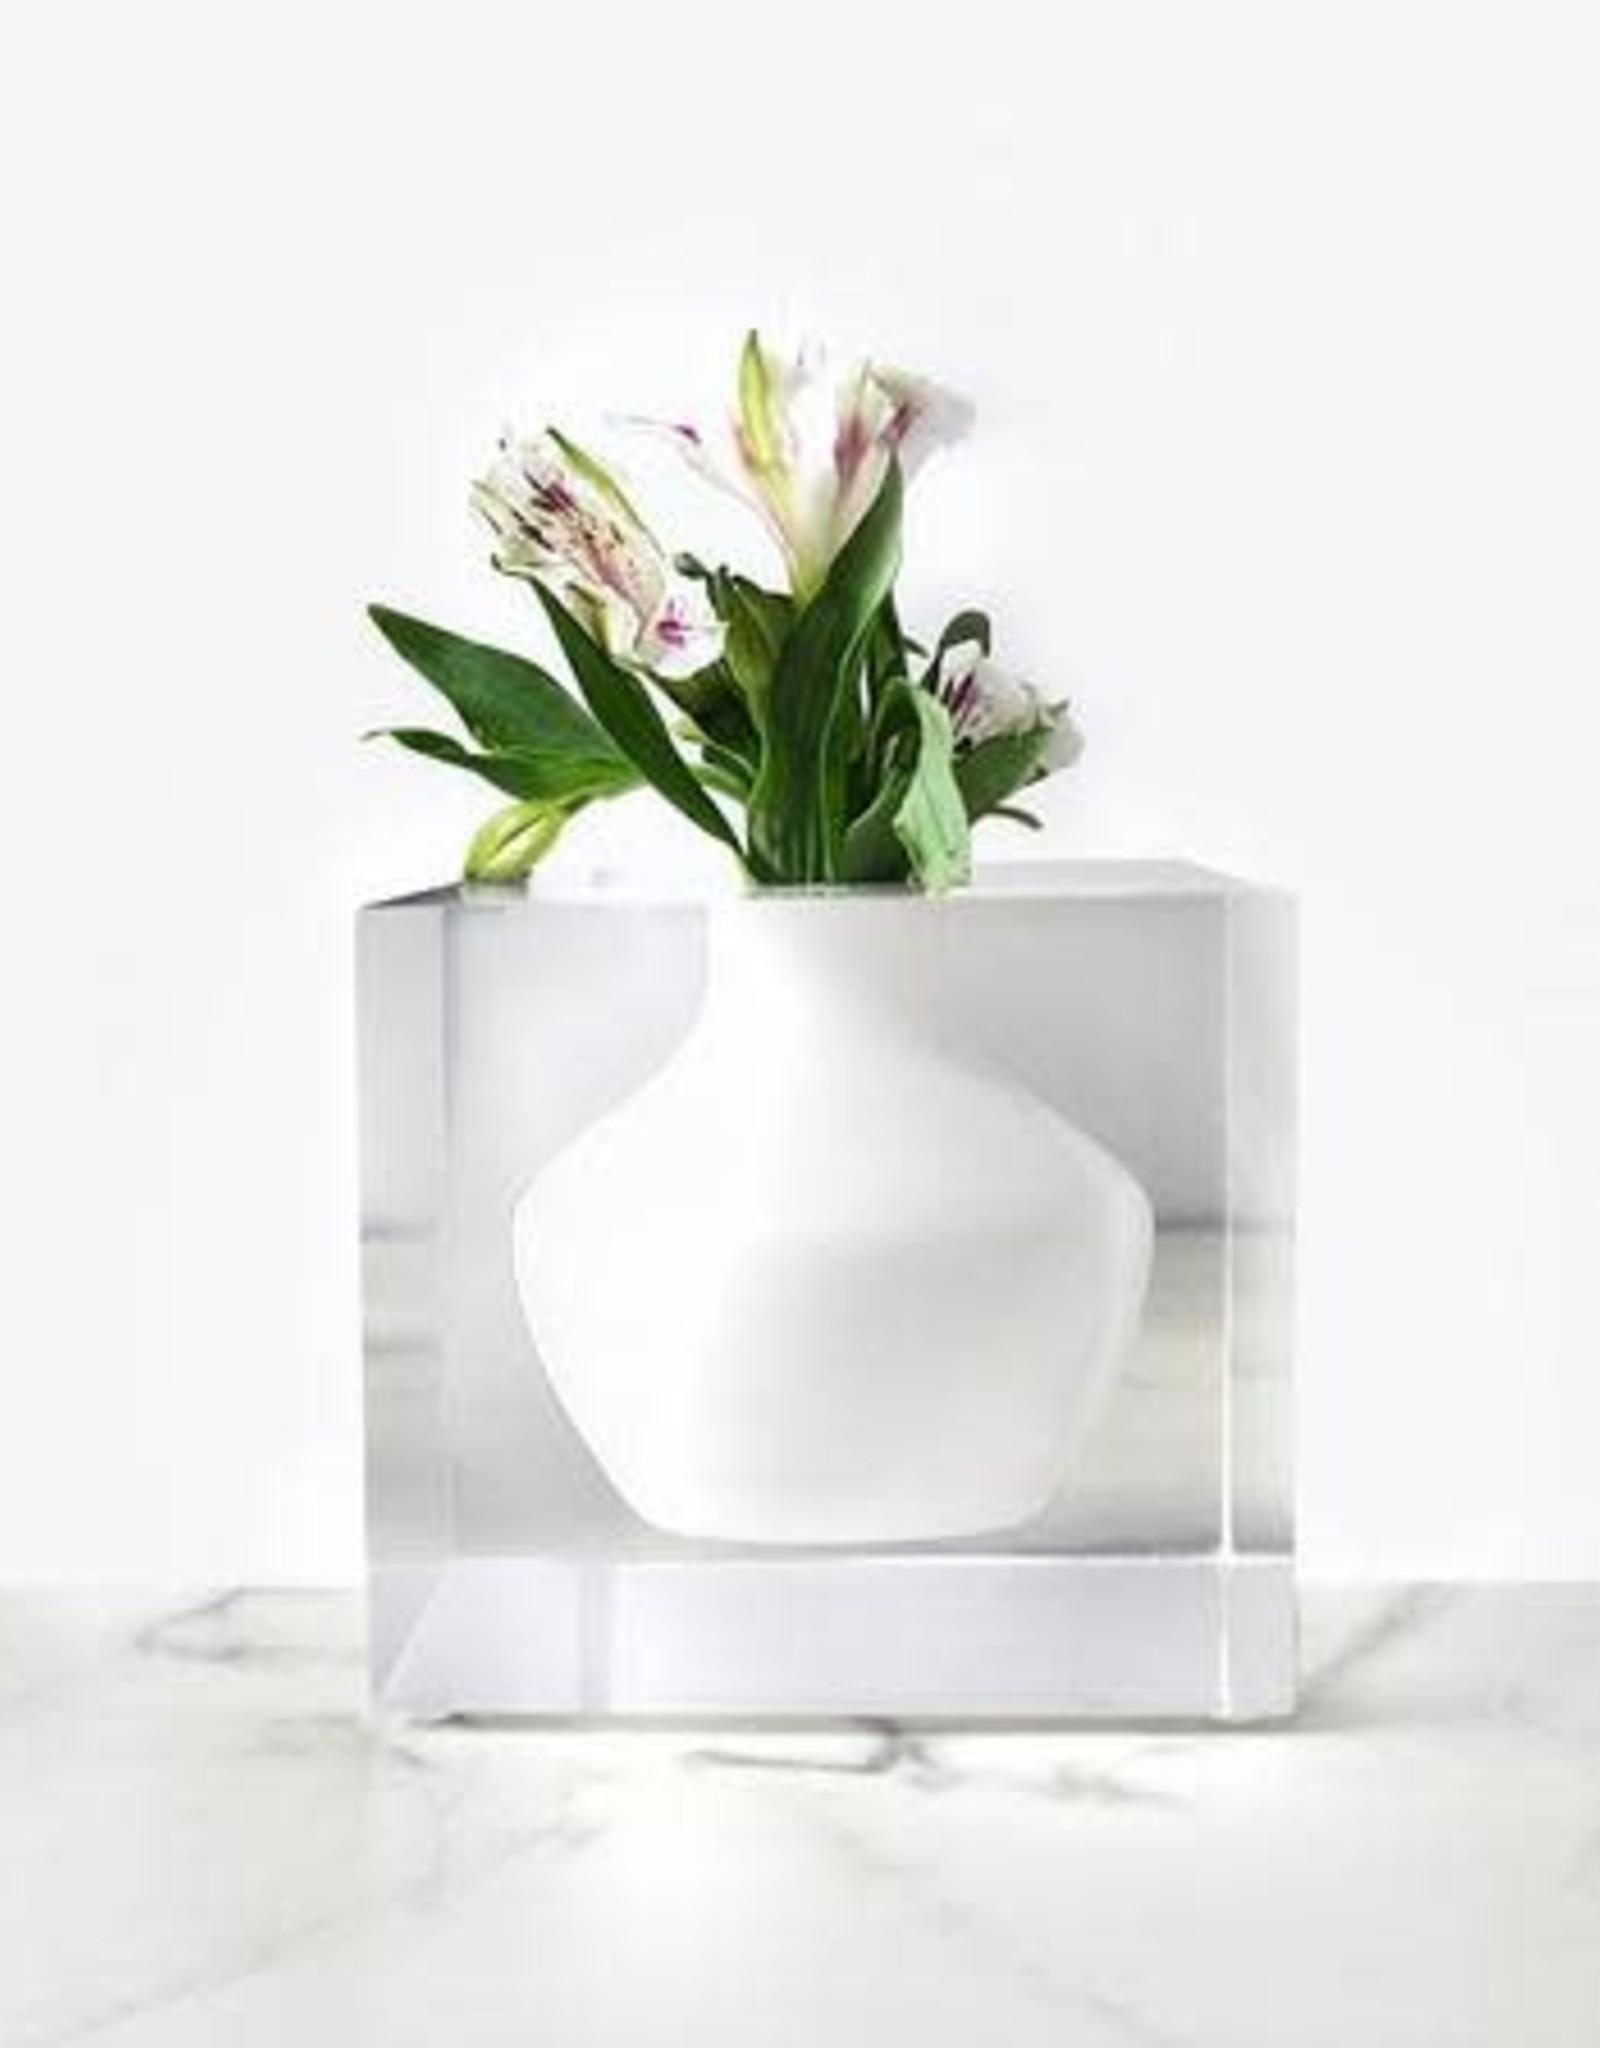 JR William Doyers Bud Vase by JR William